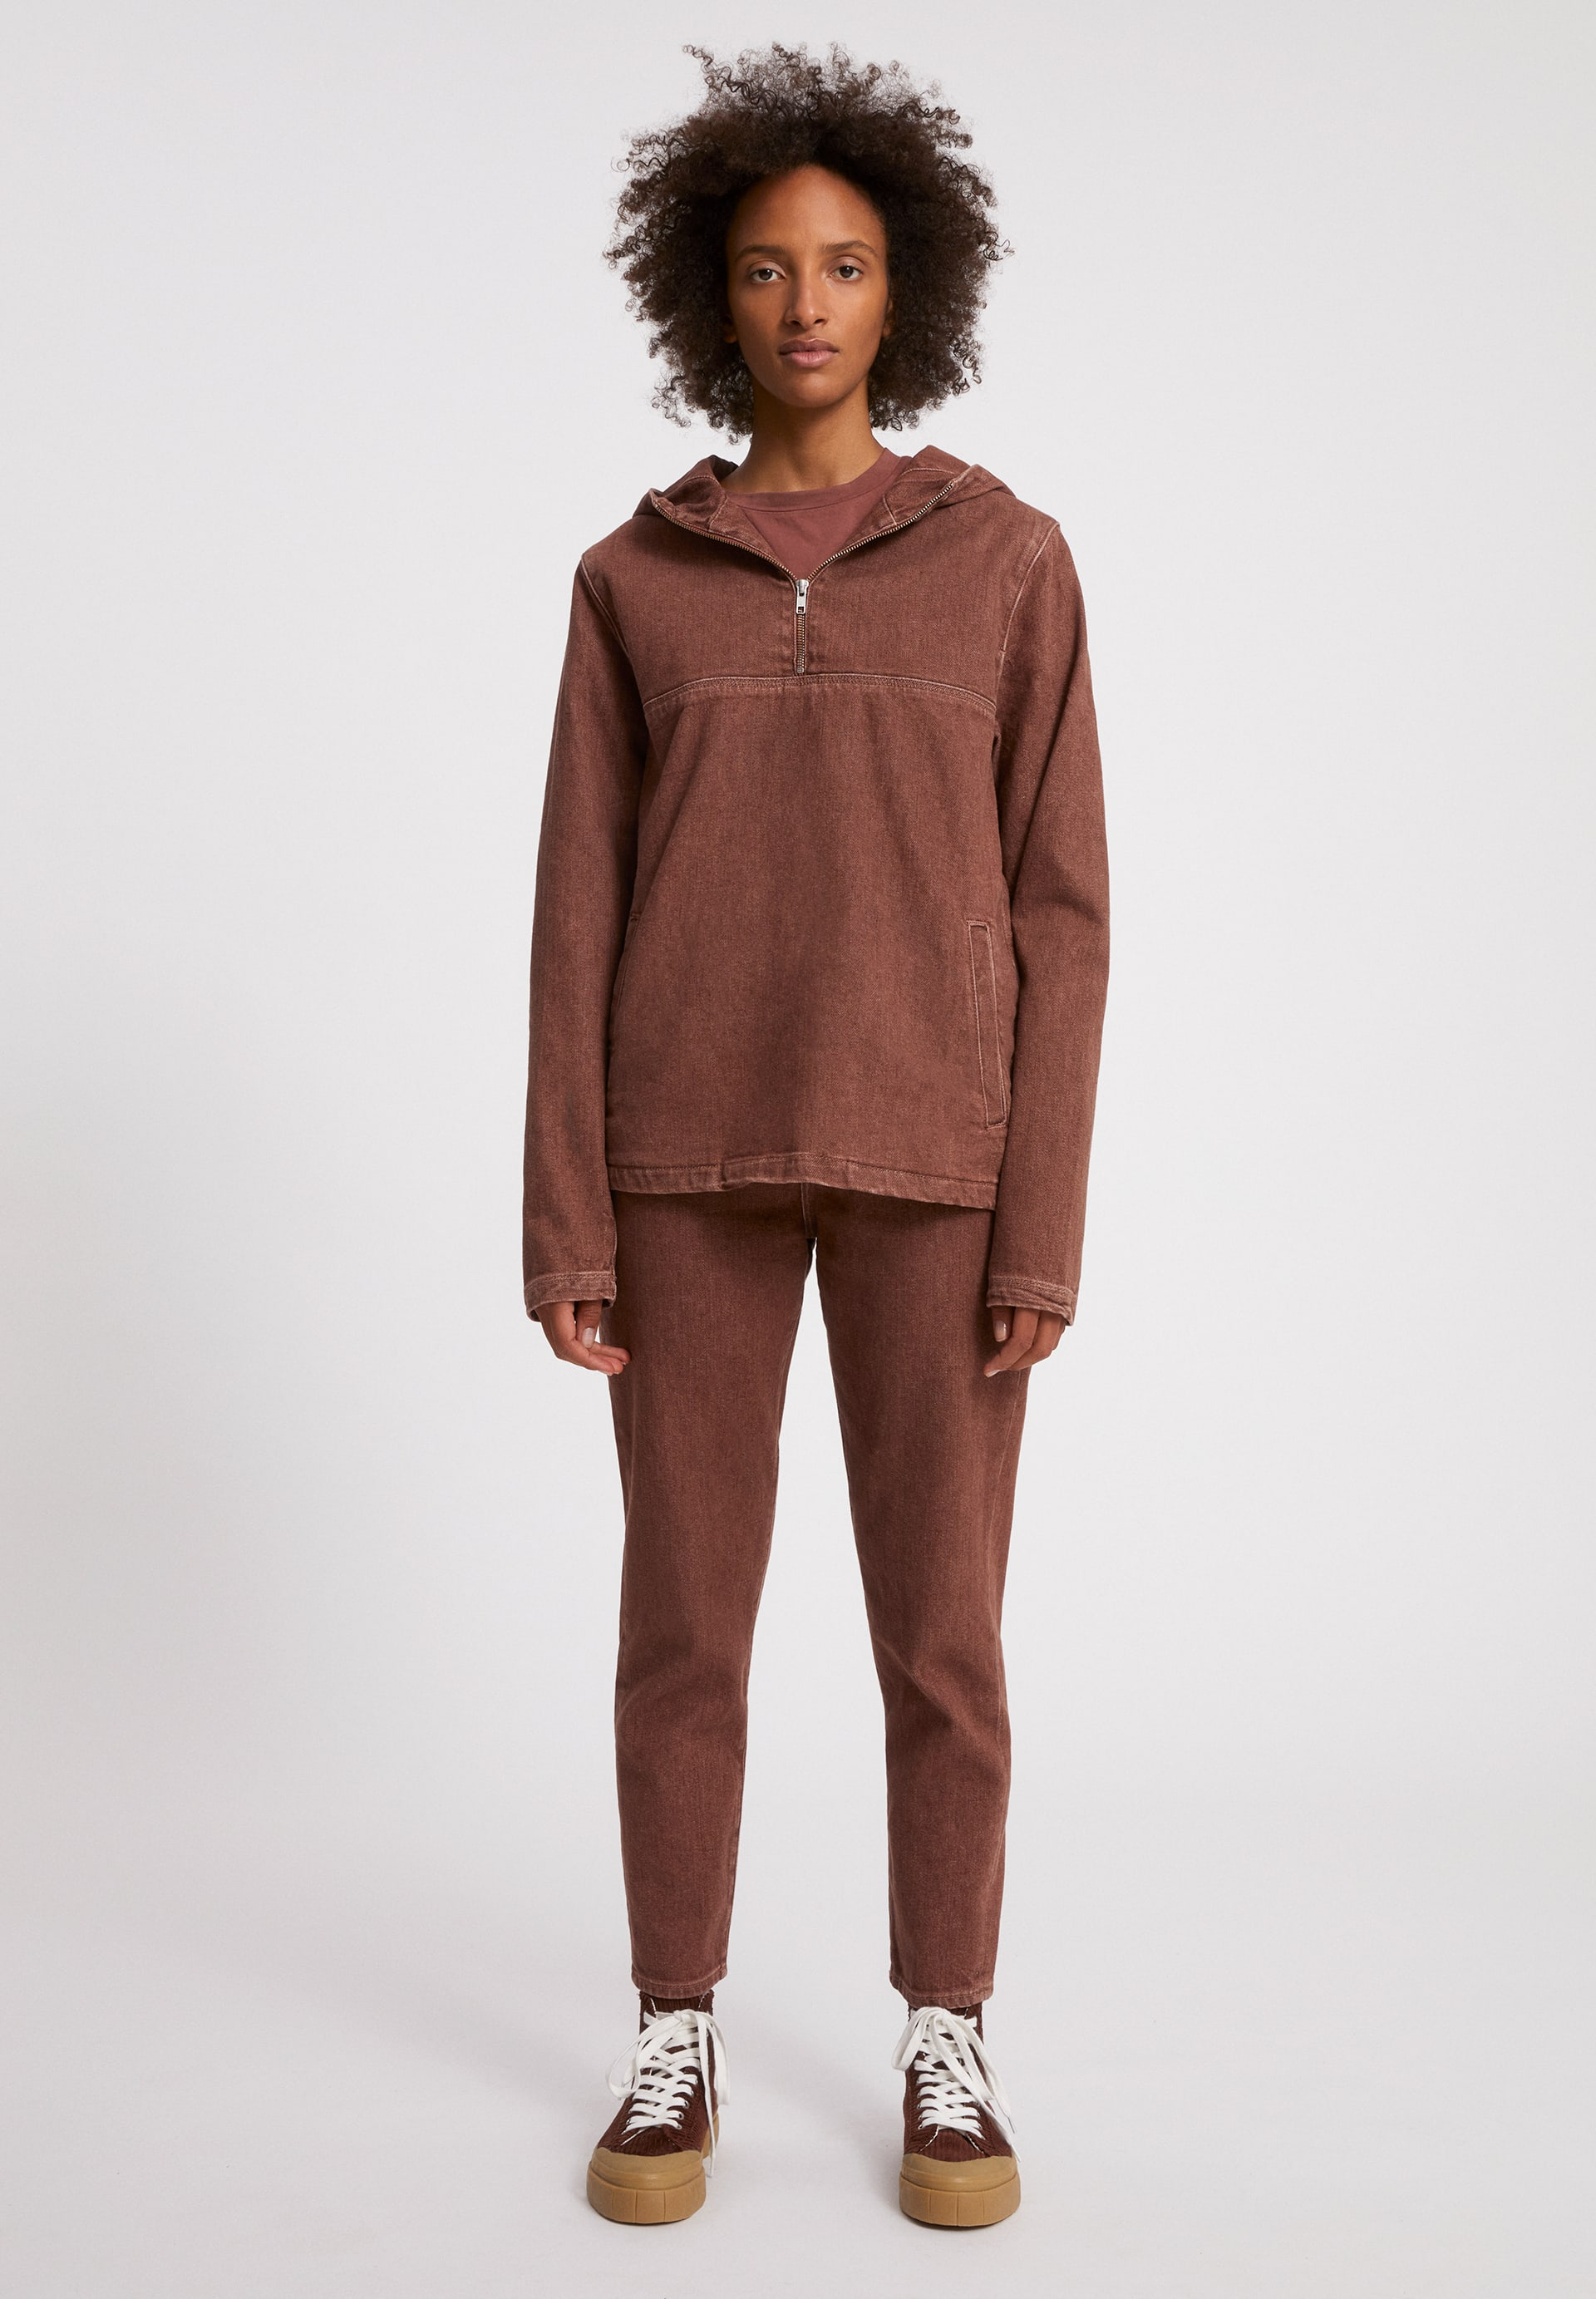 AAKIS EARTHCOLORS® Denim Jacket made of Organic Cotton Mix